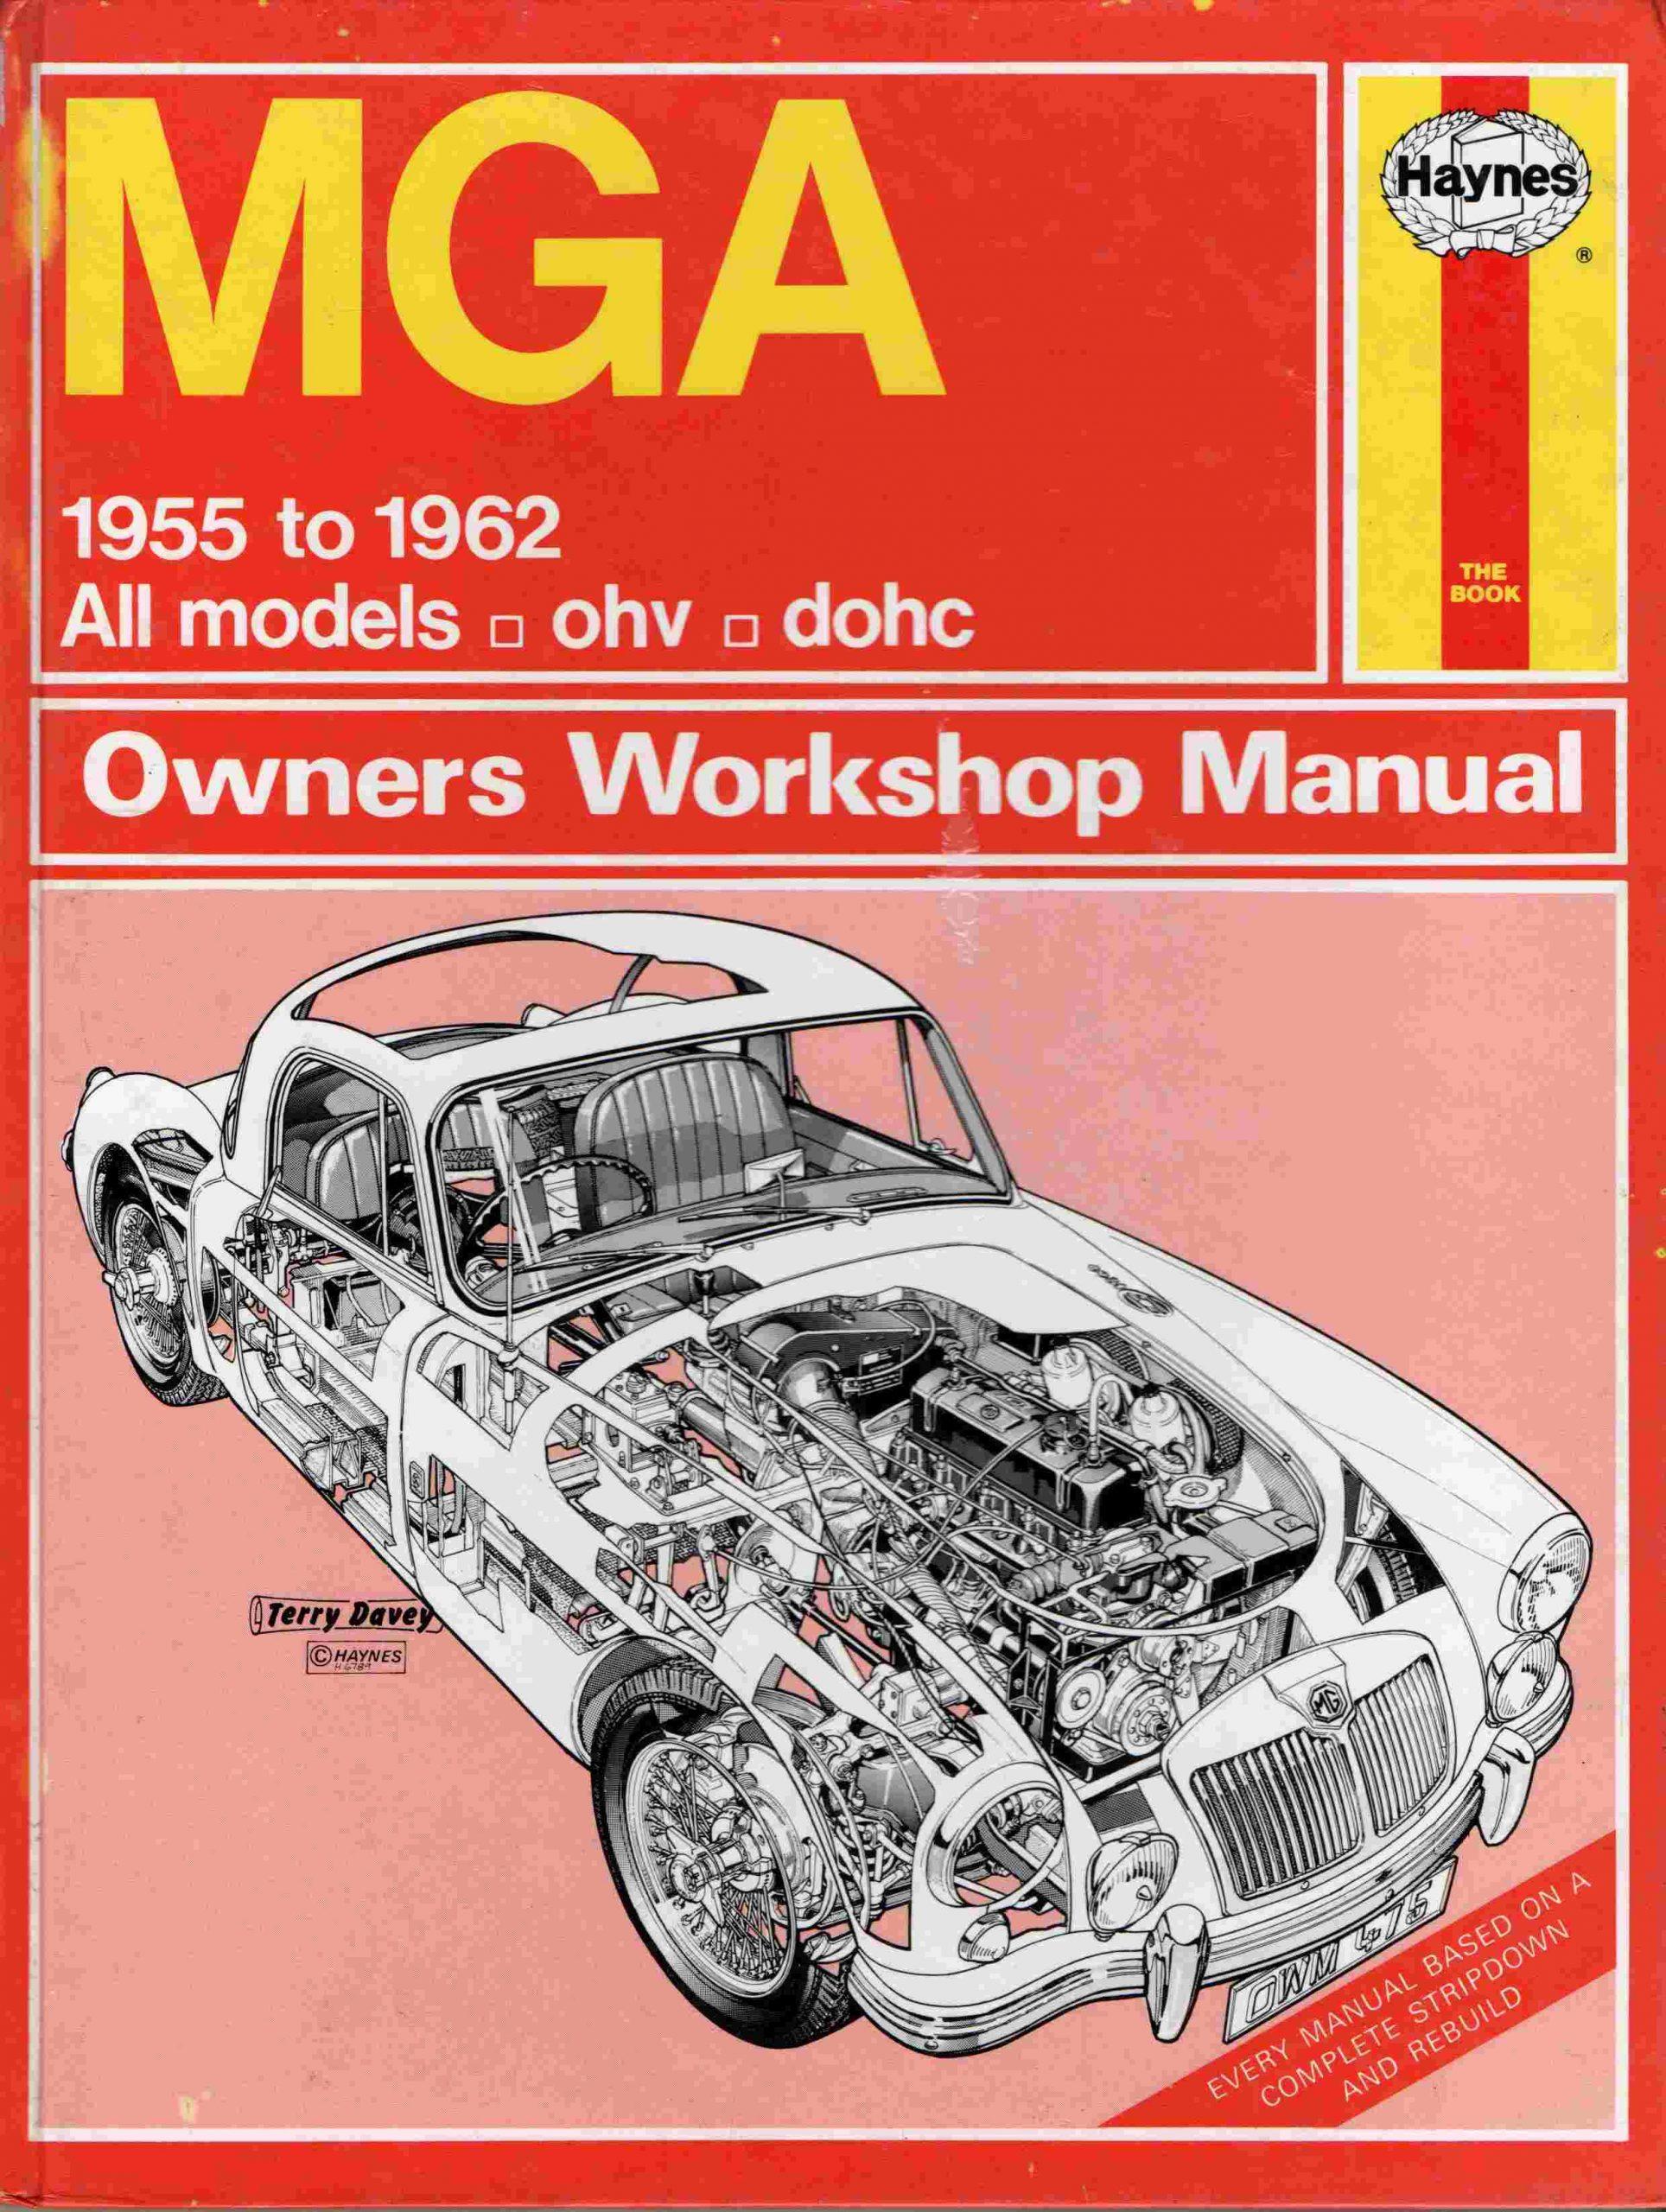 MGA  Haynes Owners Workshop Manual